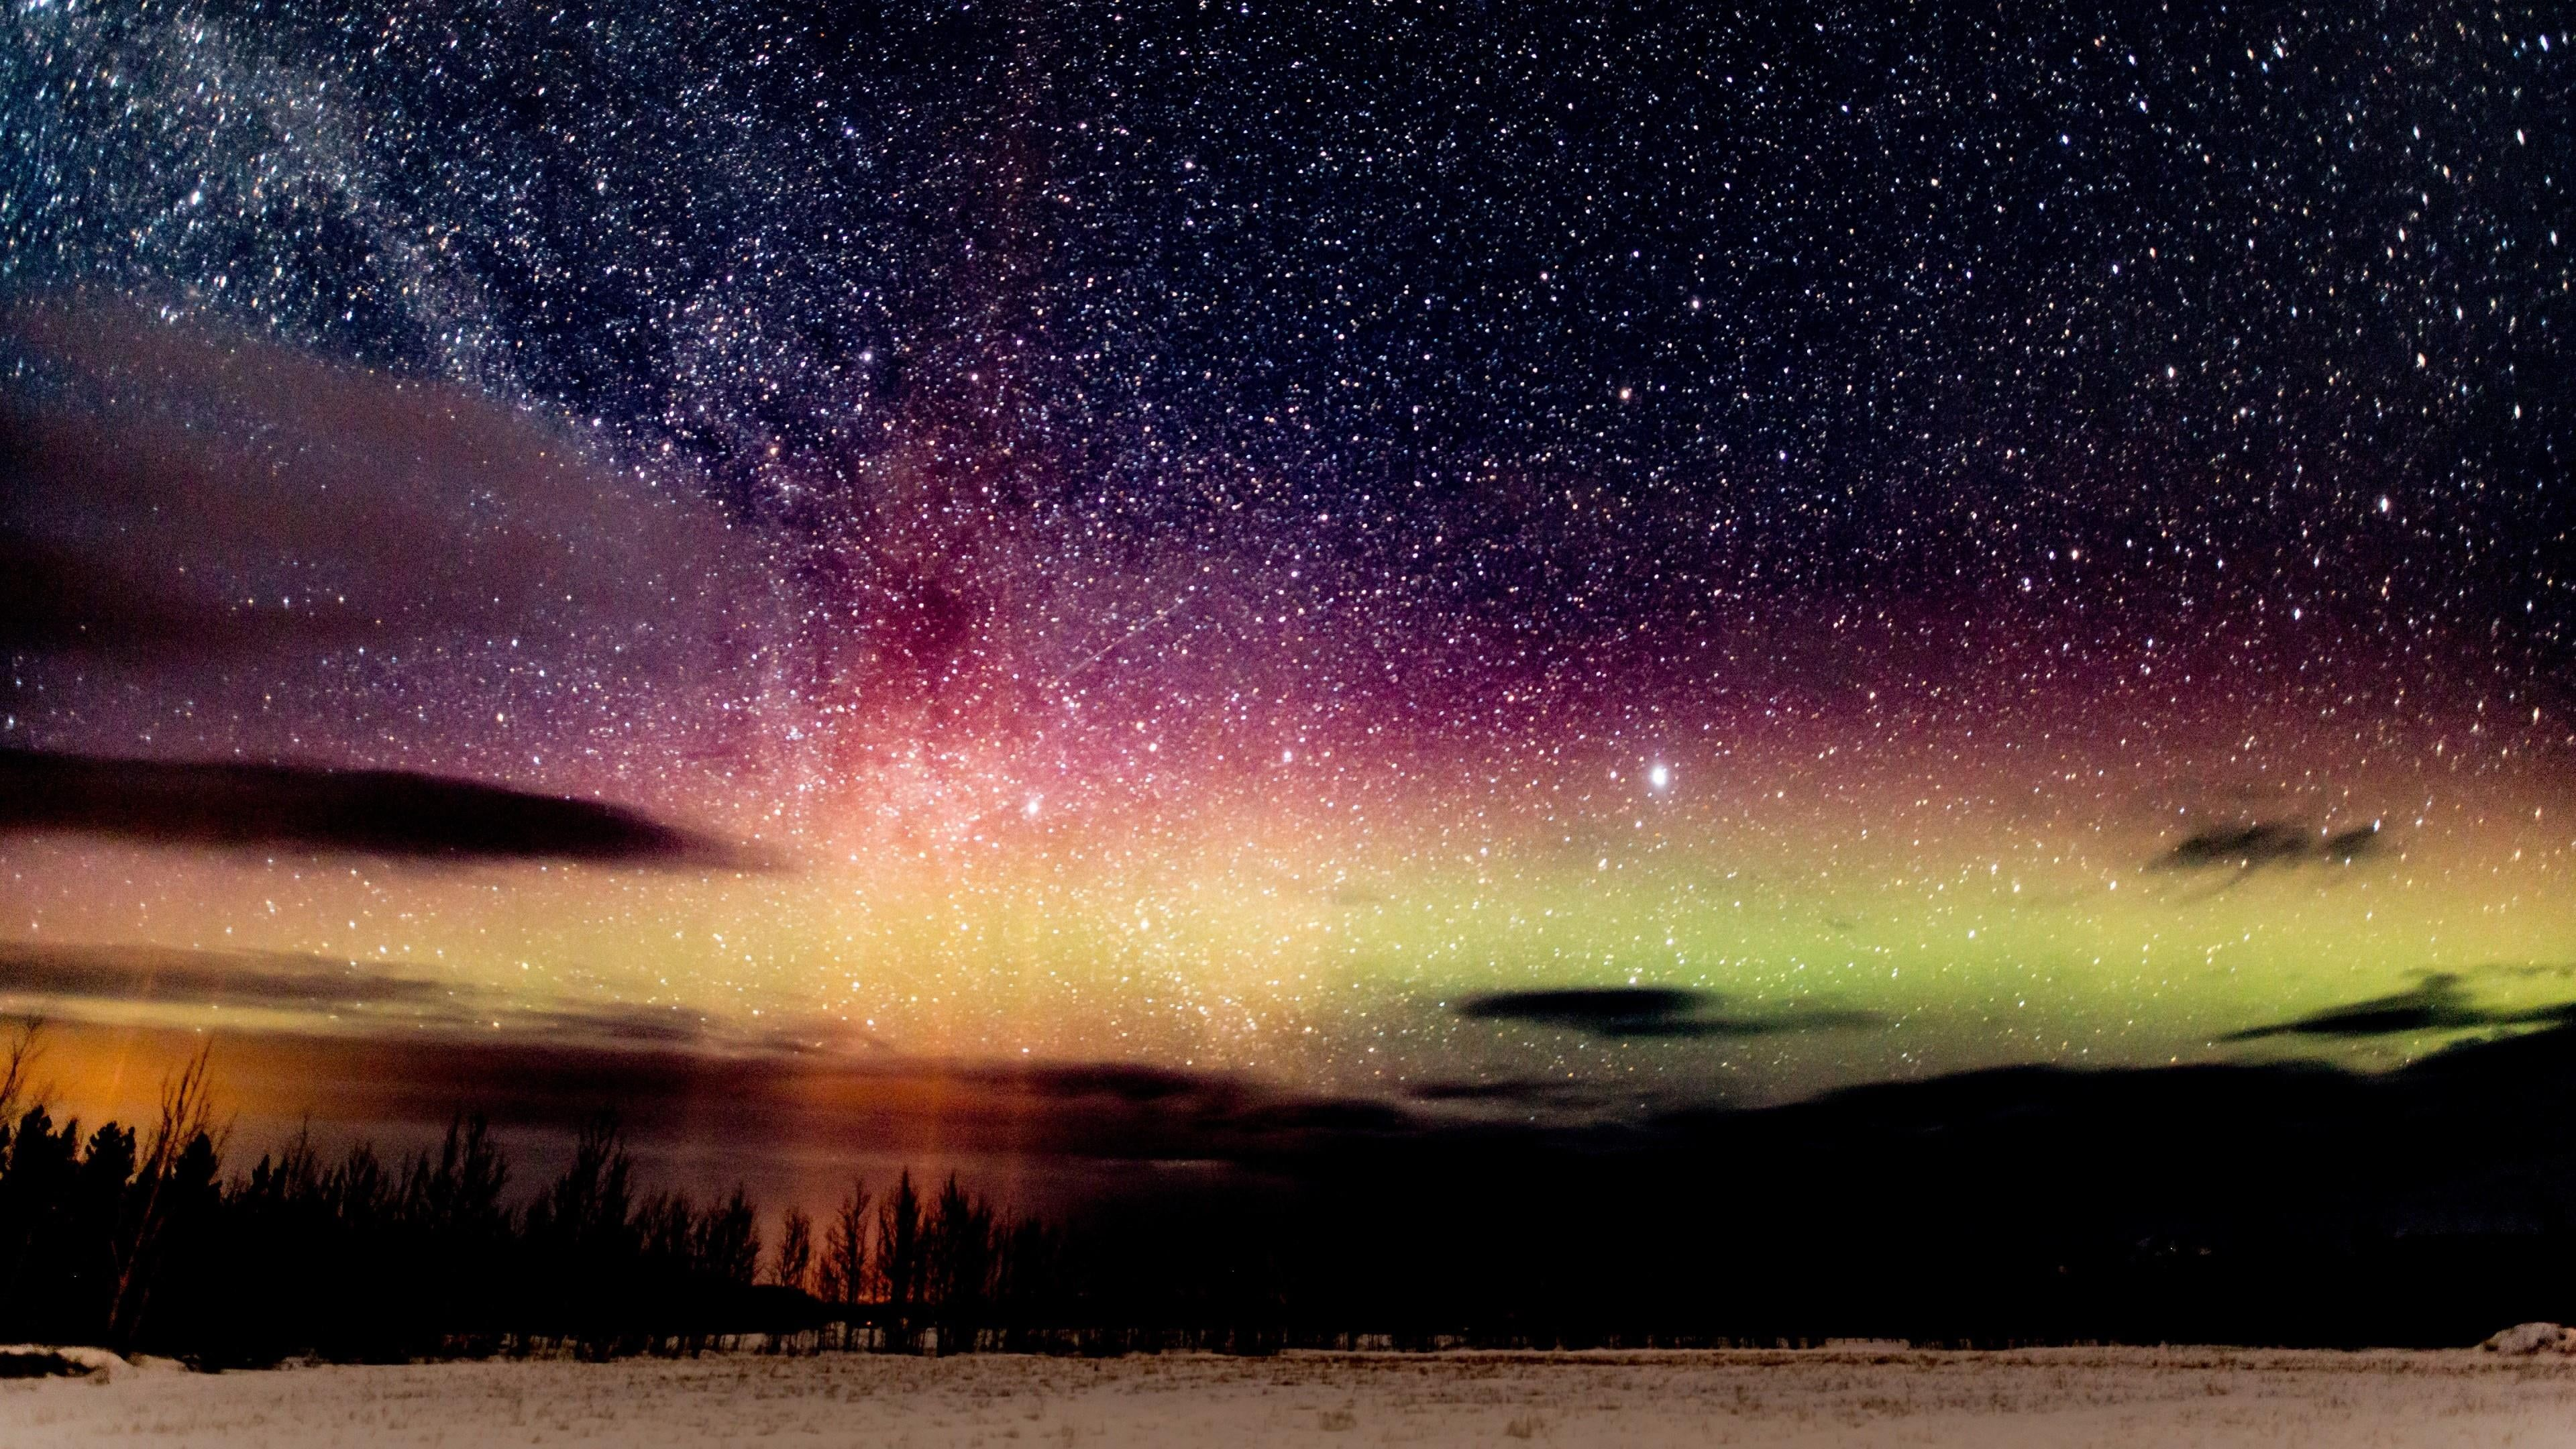 Starry Sky Glitter Stars Northern Lights Nordic Light Aurora Atmosphere Aurora Borealis P In 2020 Northern Lights Tours Northern Lights Northern Lights Holidays